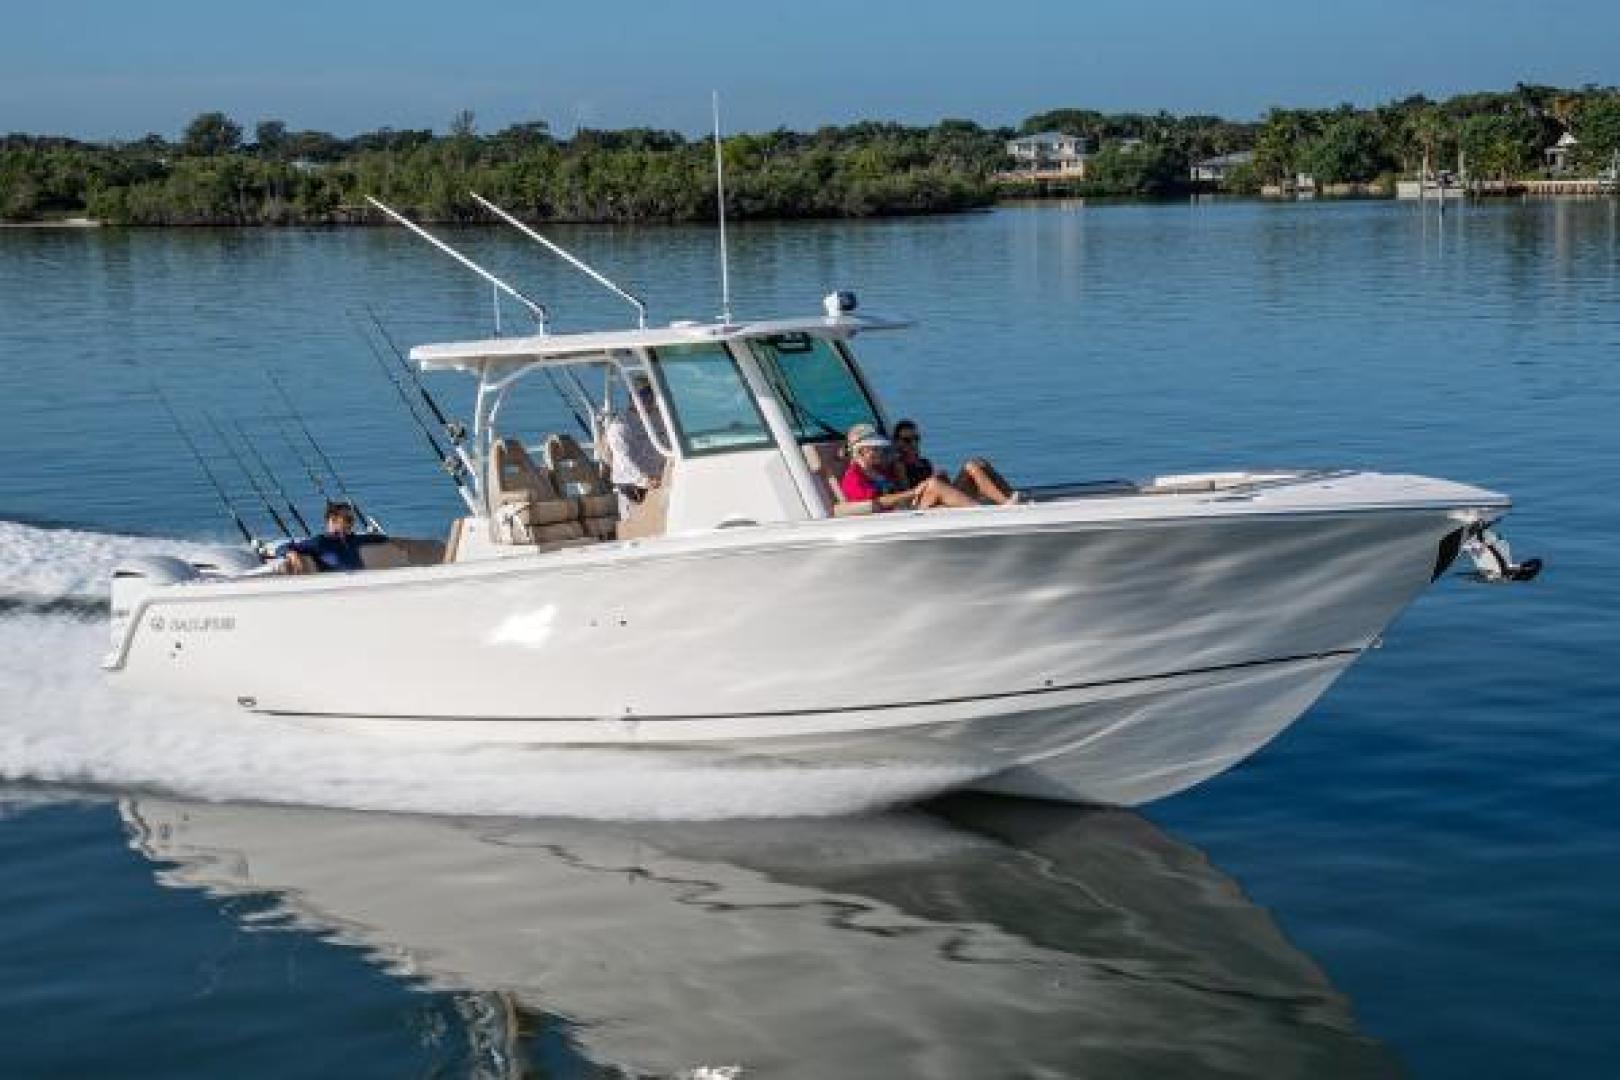 Sailfish-360 CC 2021-Sailfish 360 CC Fort Lauderdale-Florida-United States-Manufacturer Provided Image-1524498 | Thumbnail